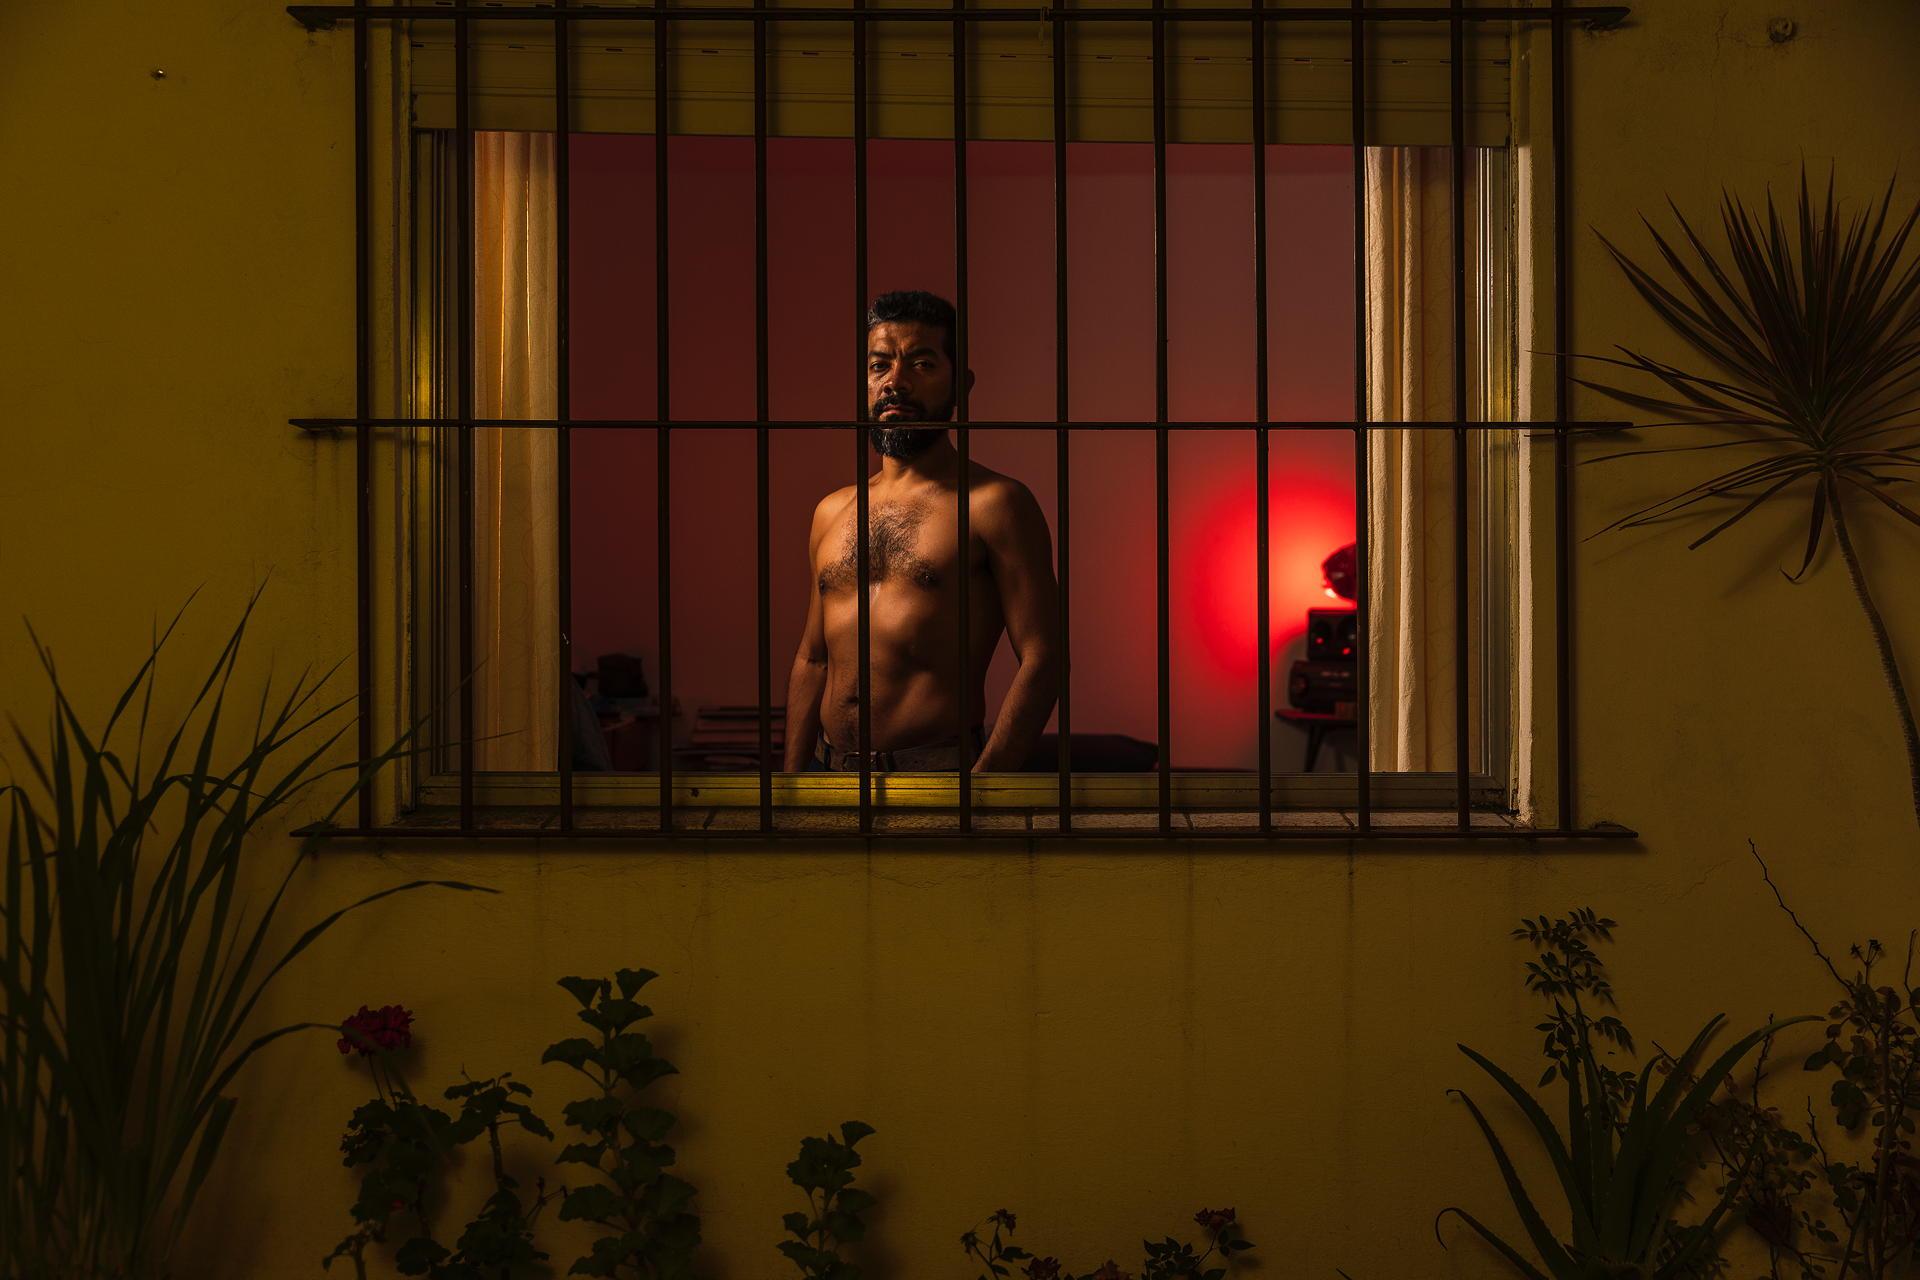 Carloman Macidiano Céspedes Riojas - Inmigracion Lgtb en Buenos Aires - Felix Schoeller Photoaward